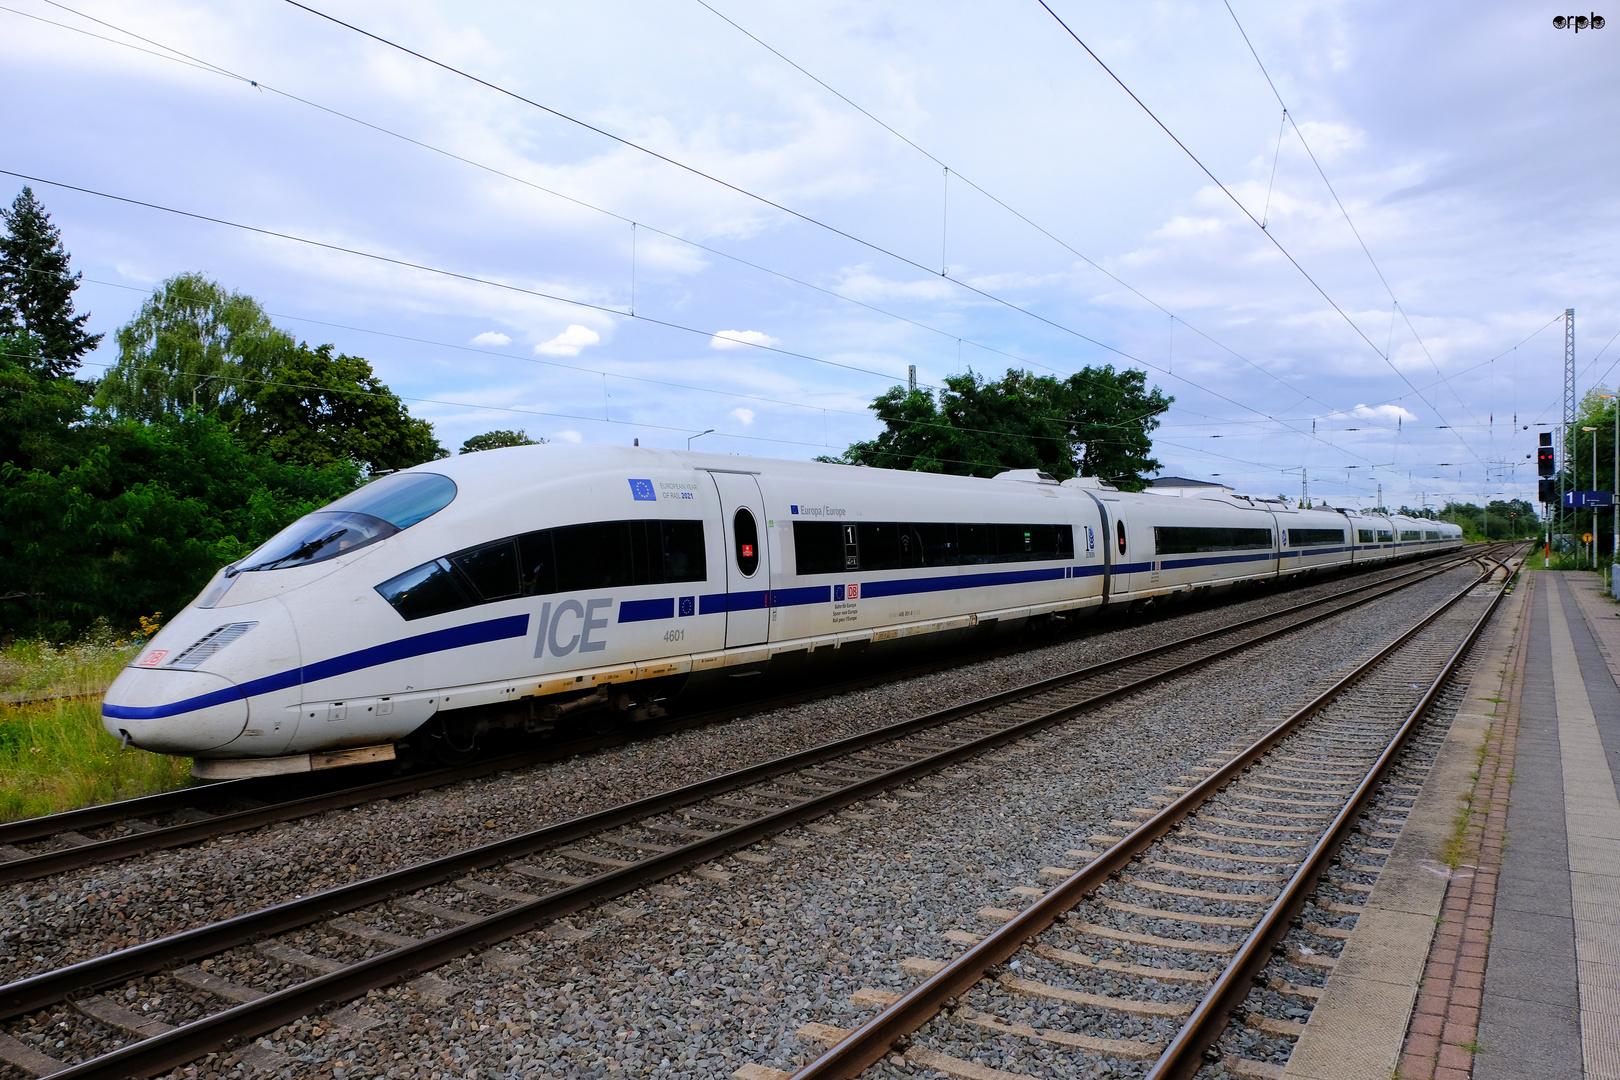 ICE 4601 European Year of Rail 2021